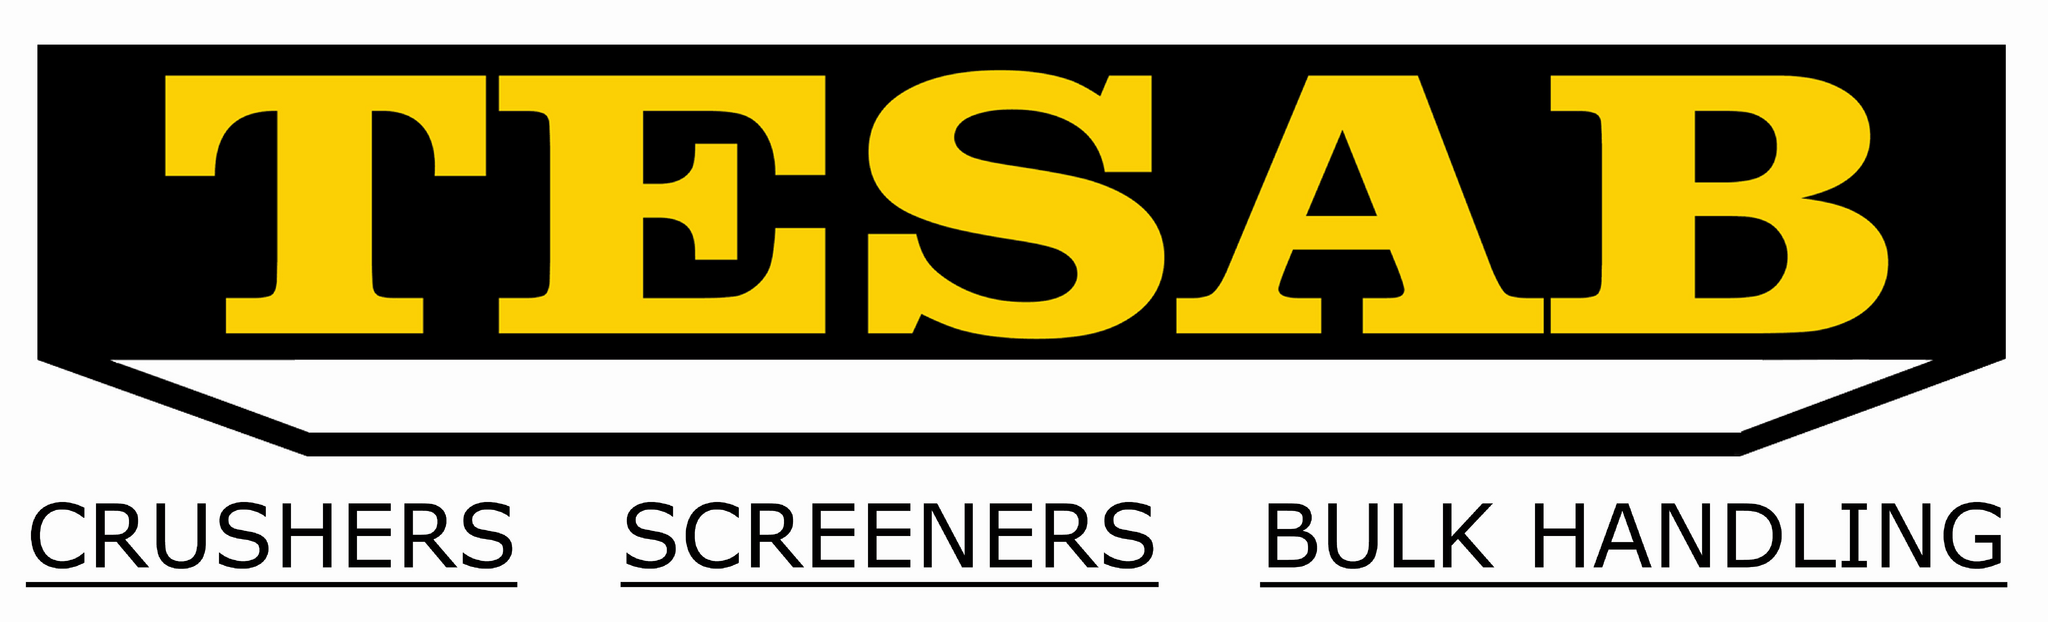 Tesab Engineering